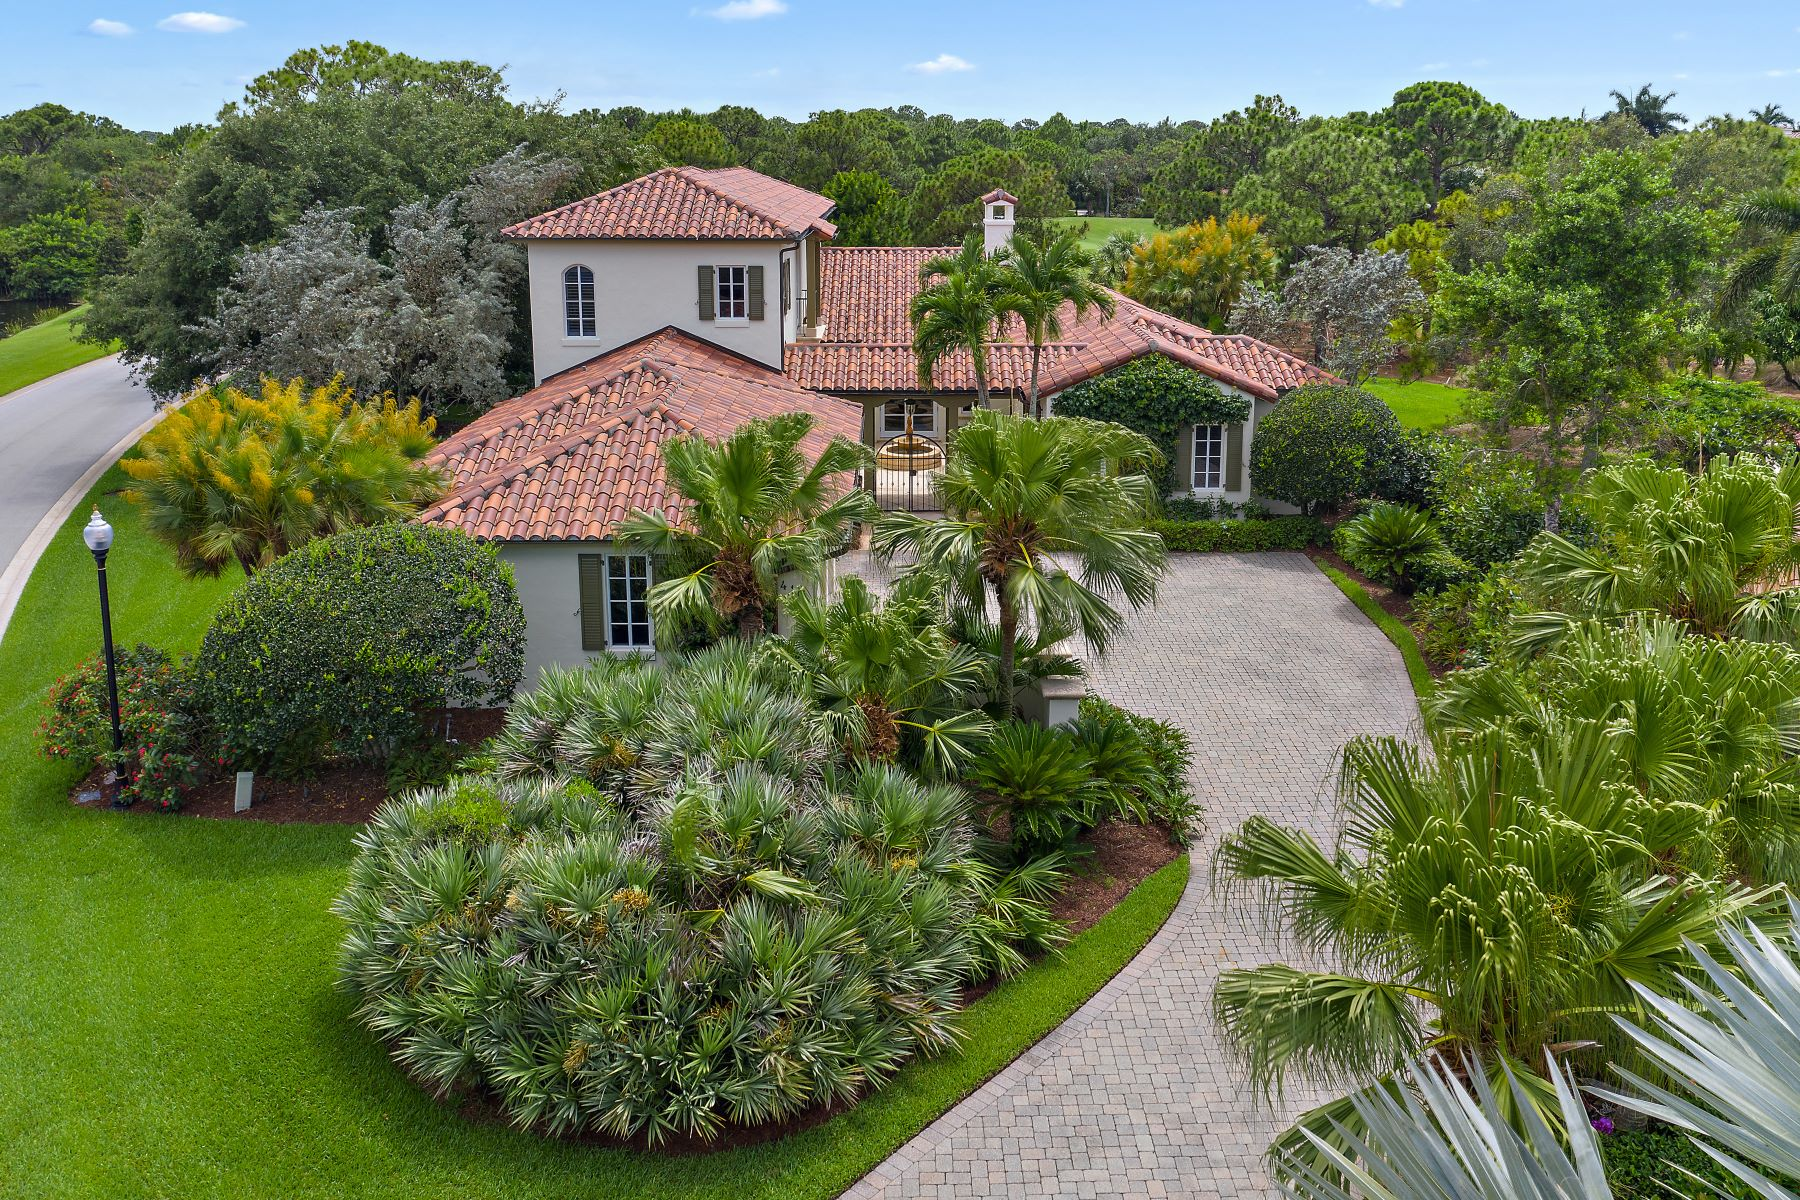 Single Family Homes for Sale at Jupiter, Florida 33477 United States